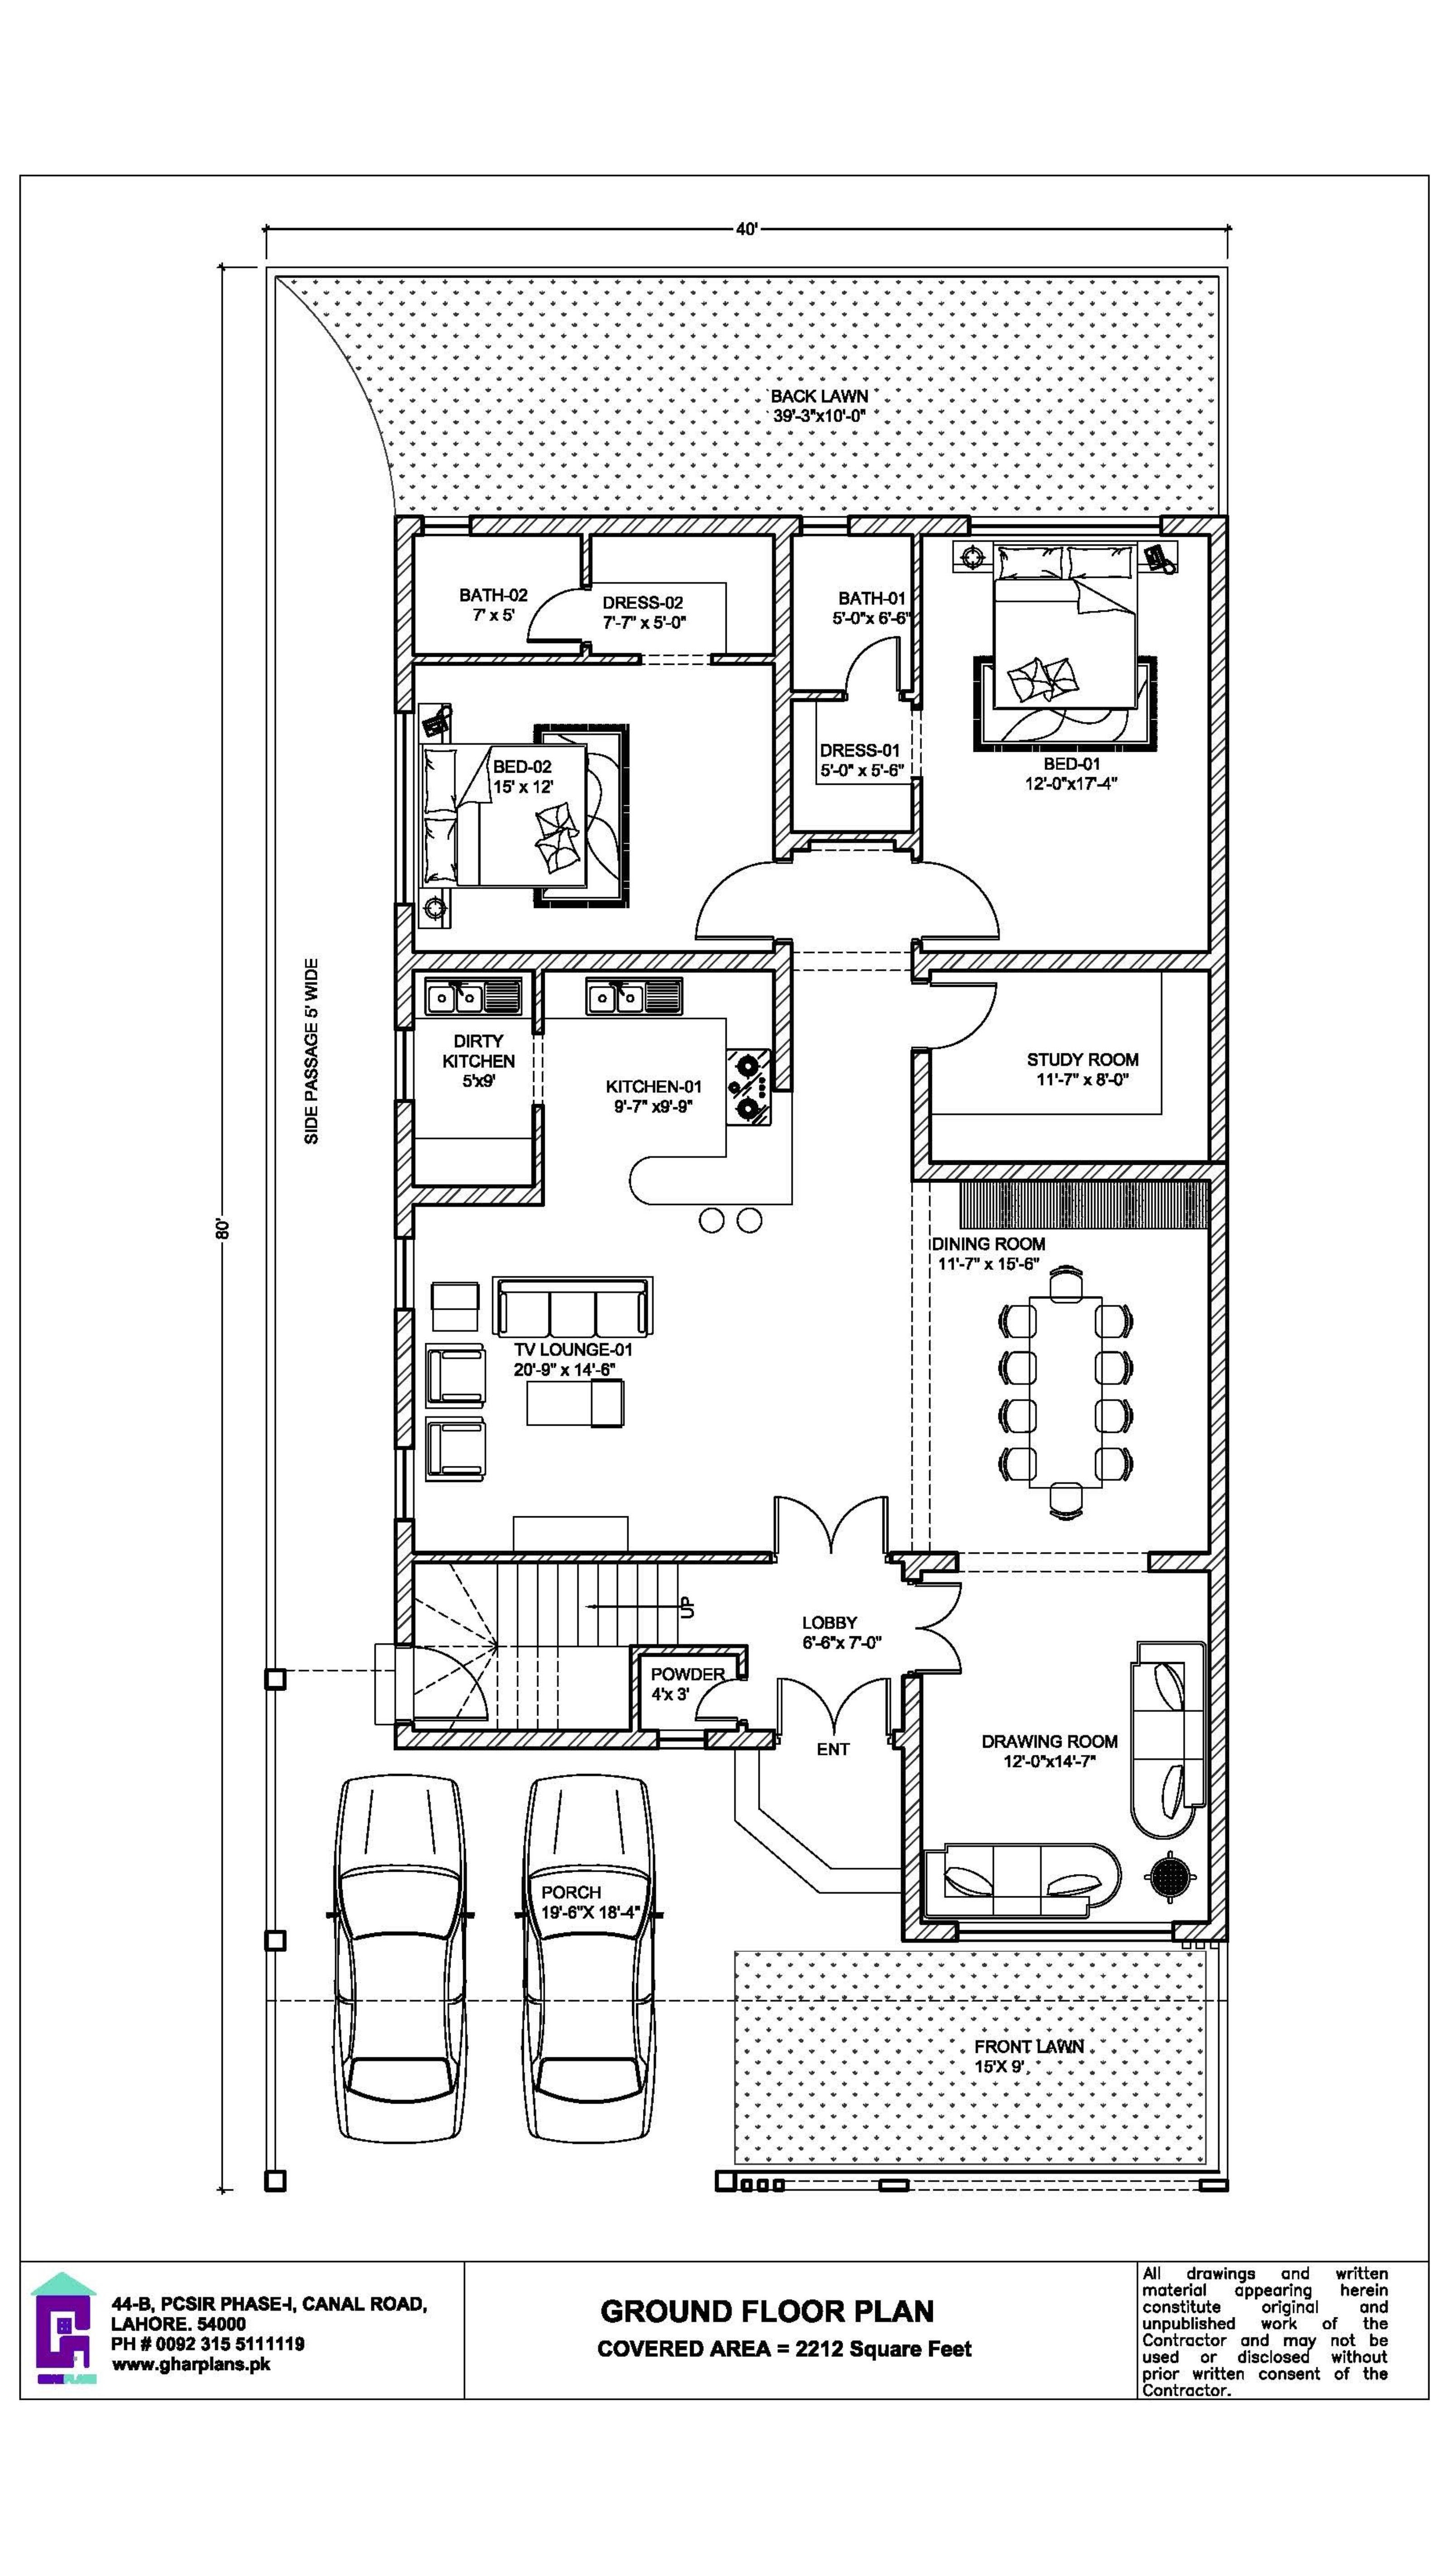 350 Square Yard House Design 40 Ft X 80 Ft Ground Floor Plan Square House Plans House Floor Design Home Design Floor Plans